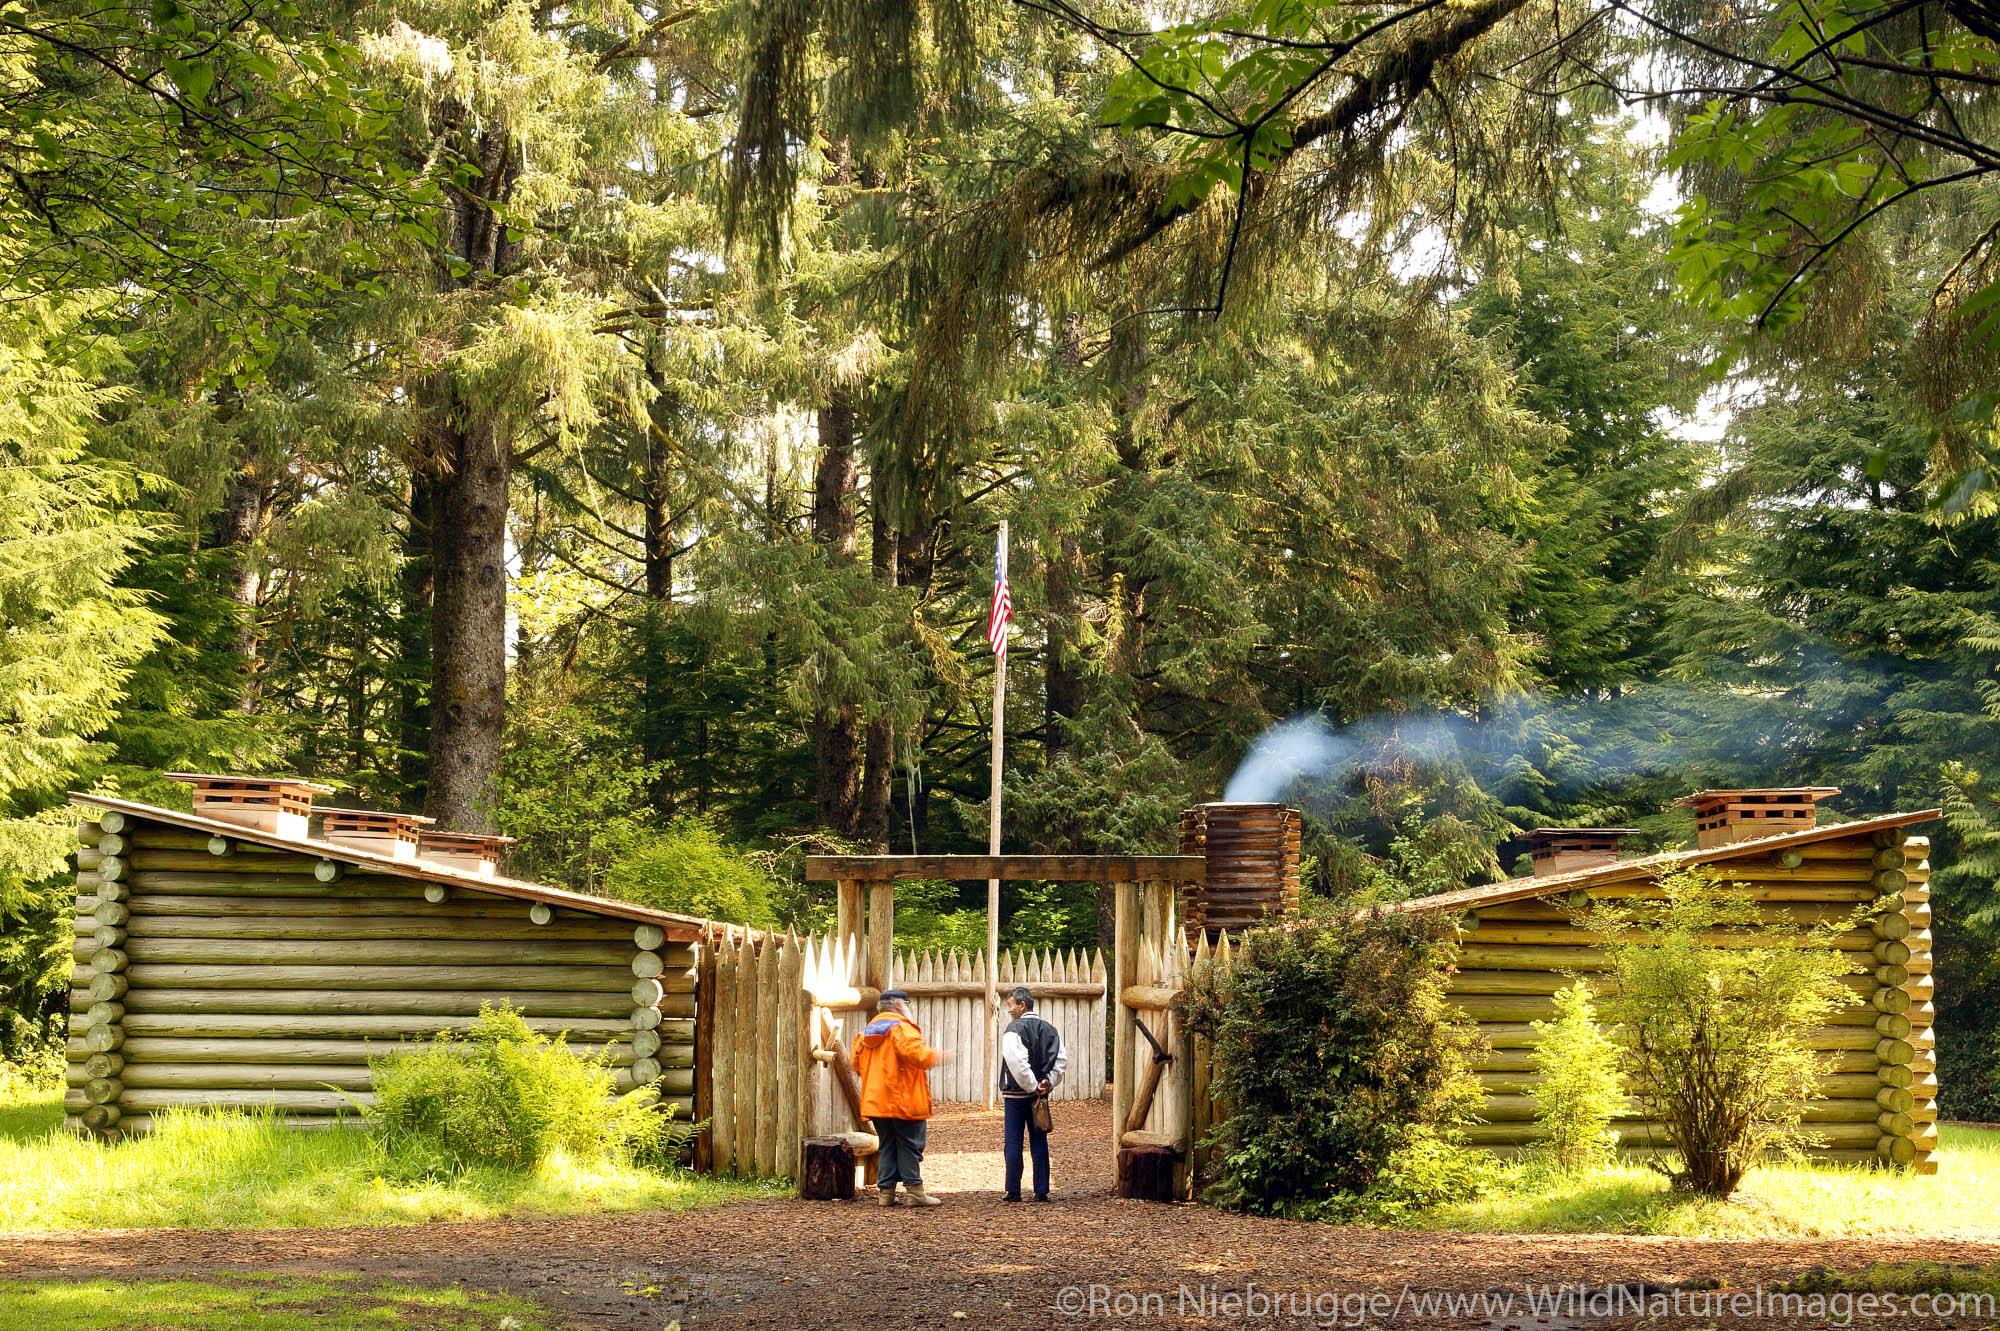 Visitors at Fort Clatsop National Memorial, near Astoria, Oregon.